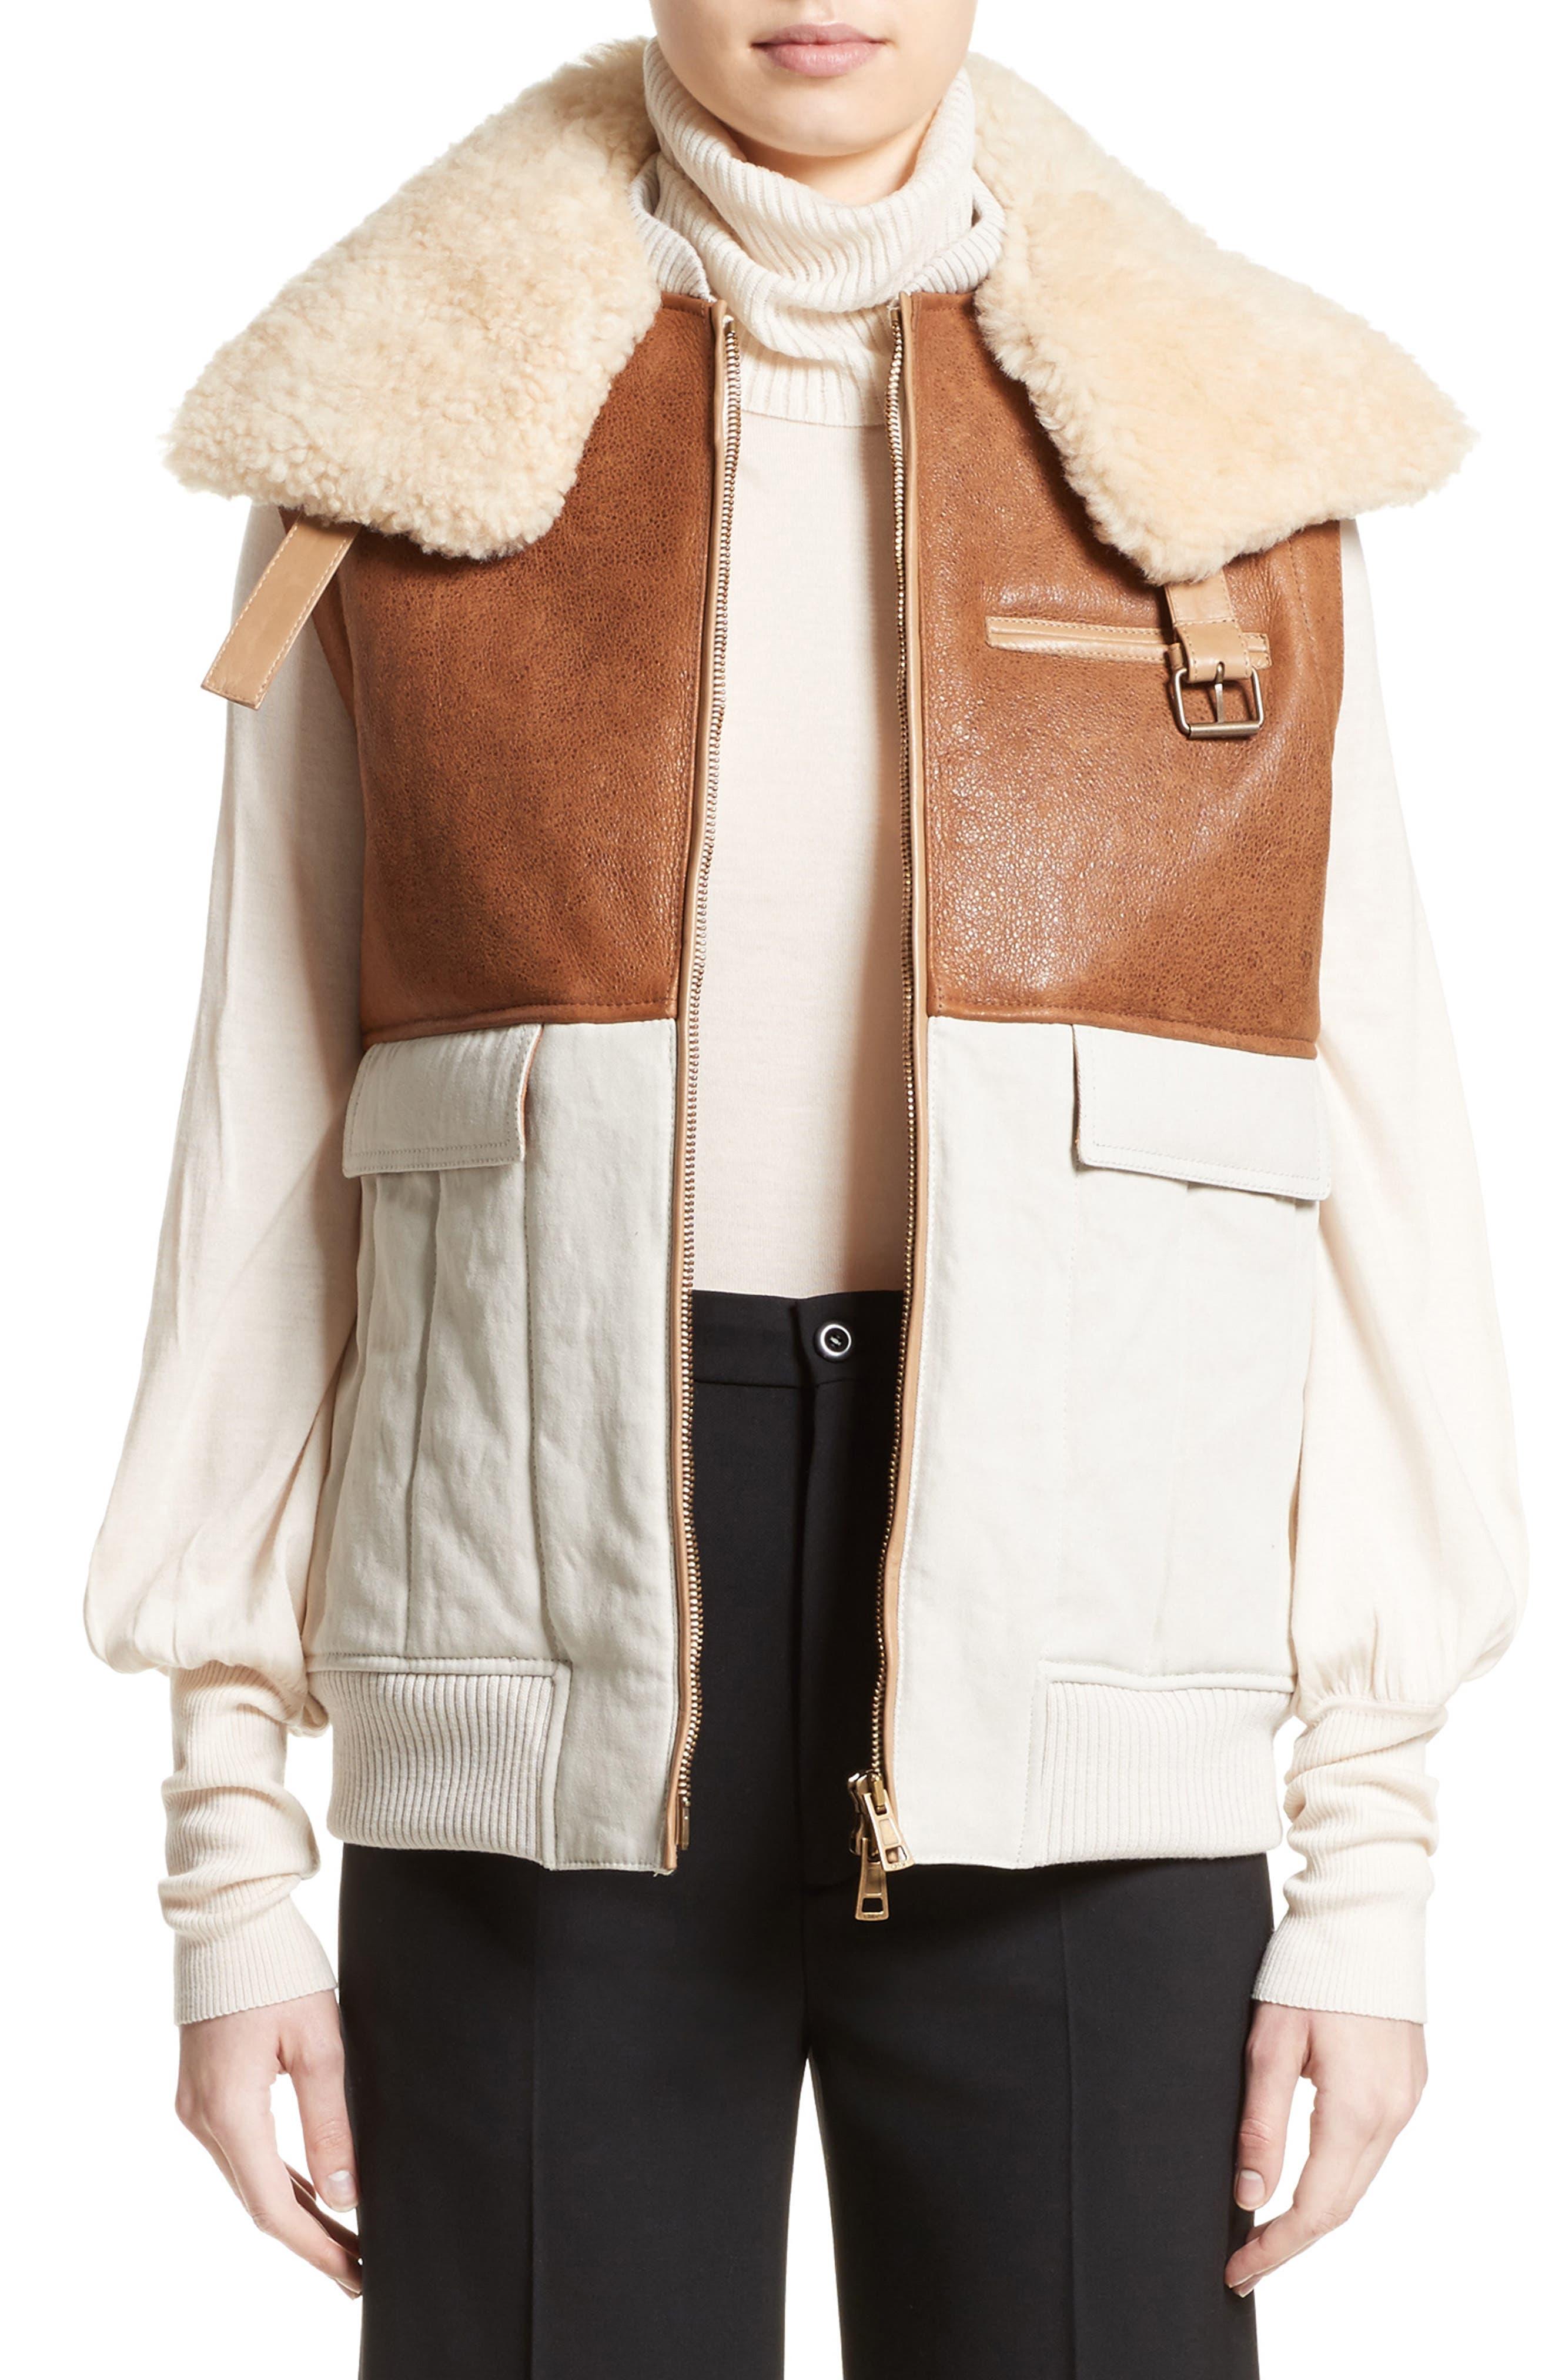 CHLOÉ Genuine Shearling Trim Leather & Cotton Vest